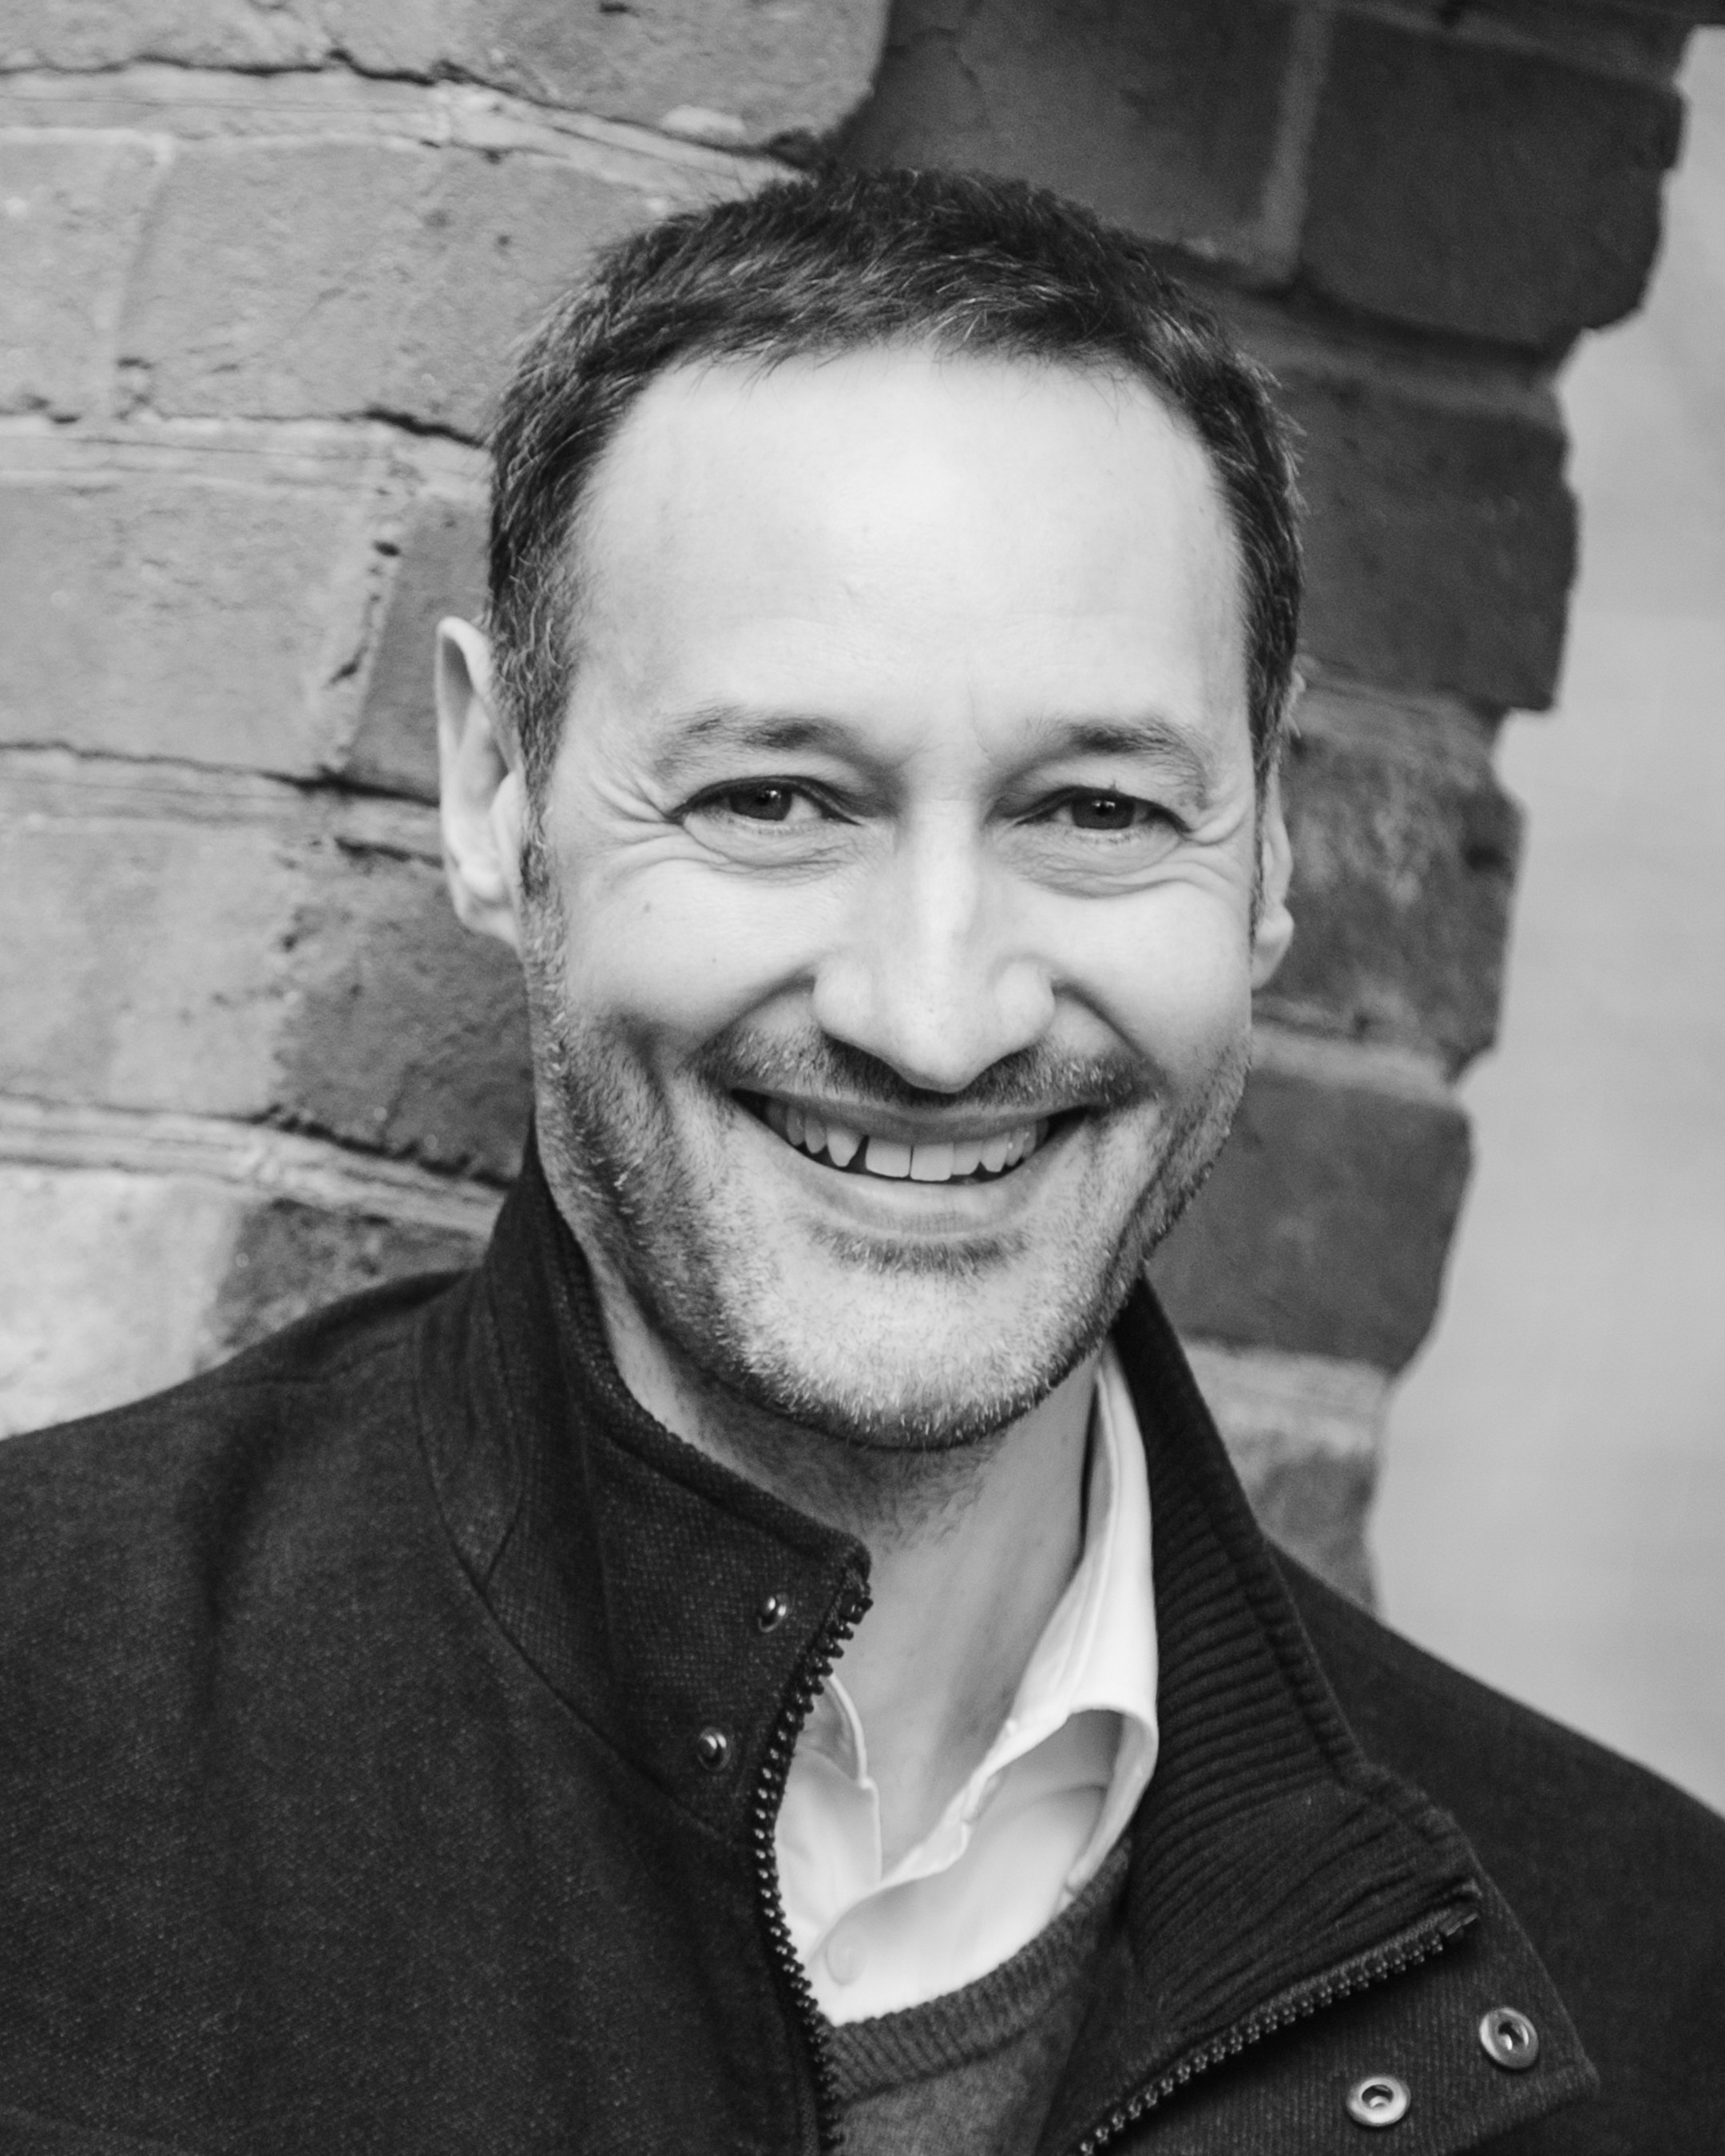 Author Emmanuel Oberg